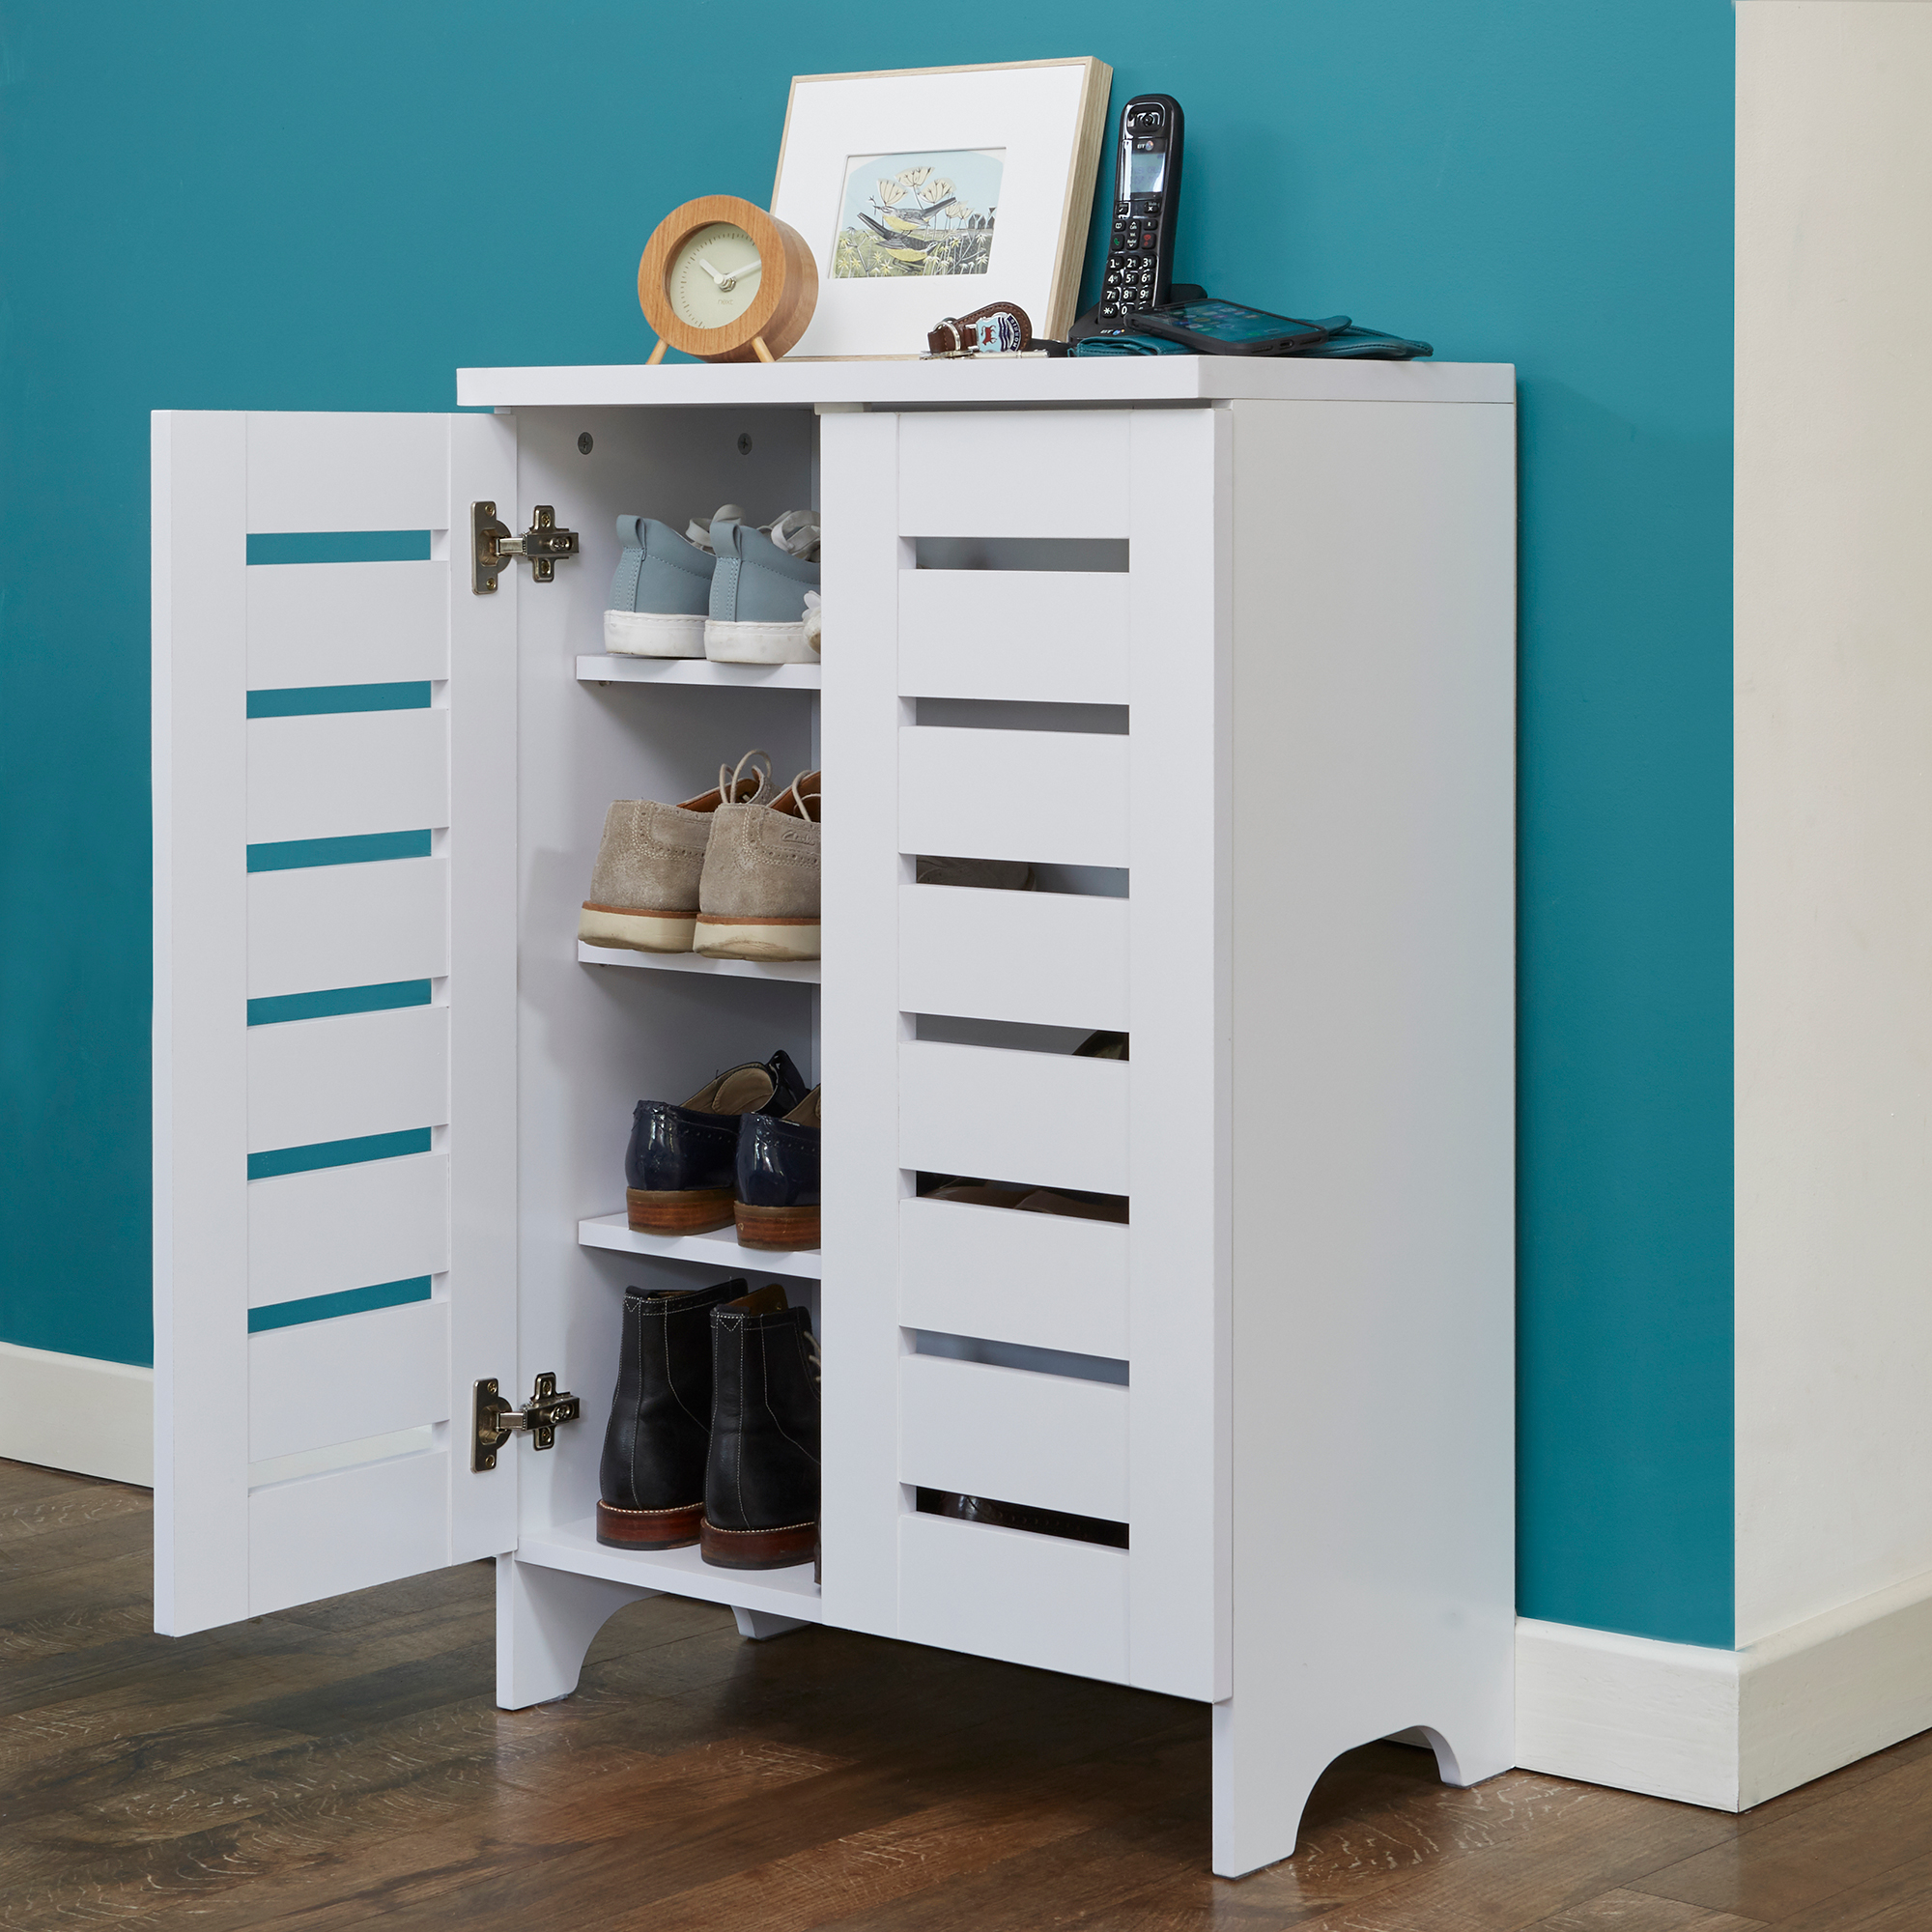 White Slatted Shoe Storage Cabinet | STORE